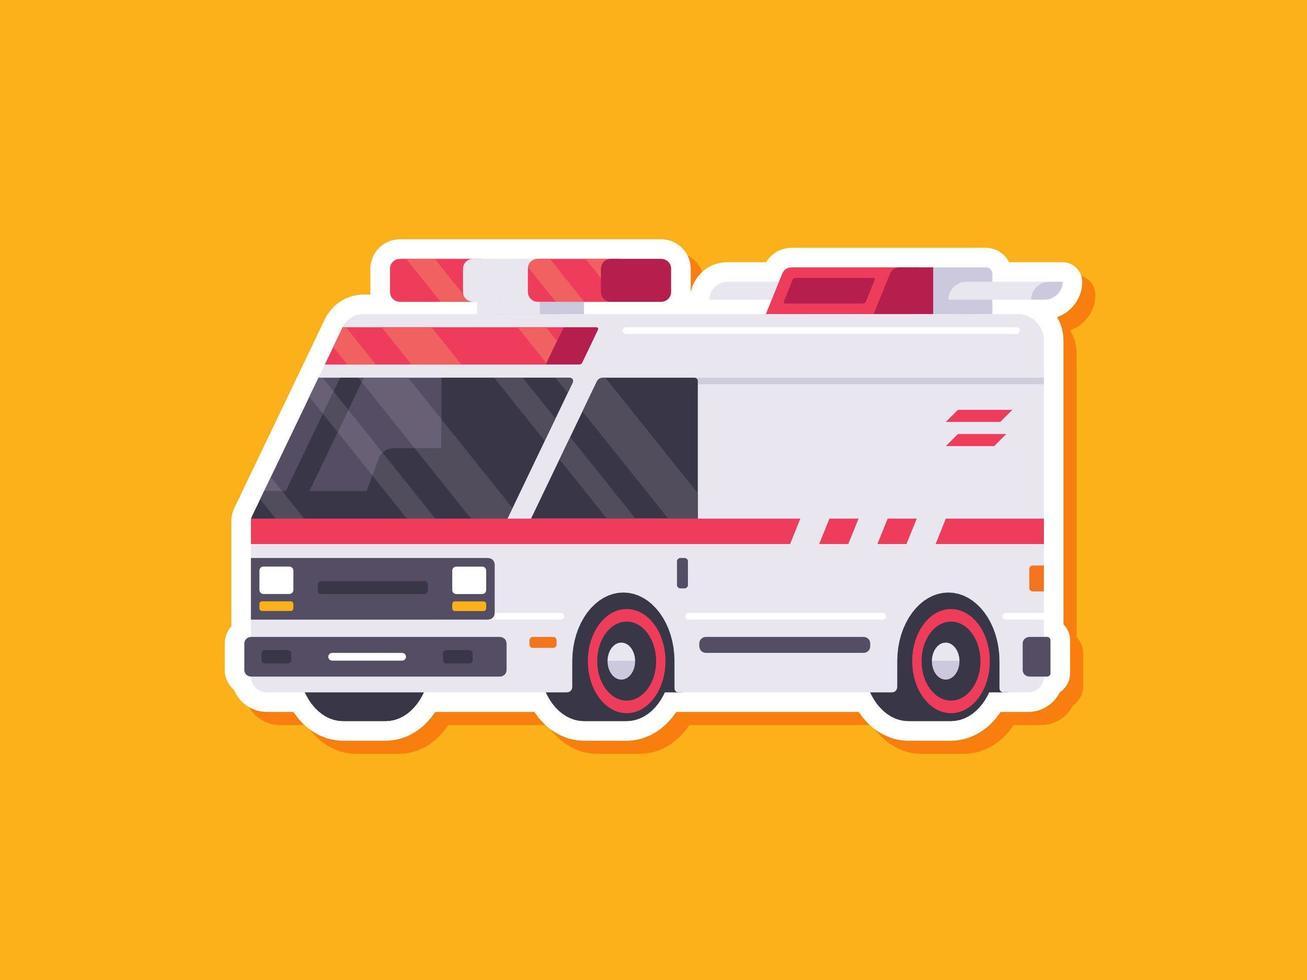 ambulance sticker in vlakke stijl vector